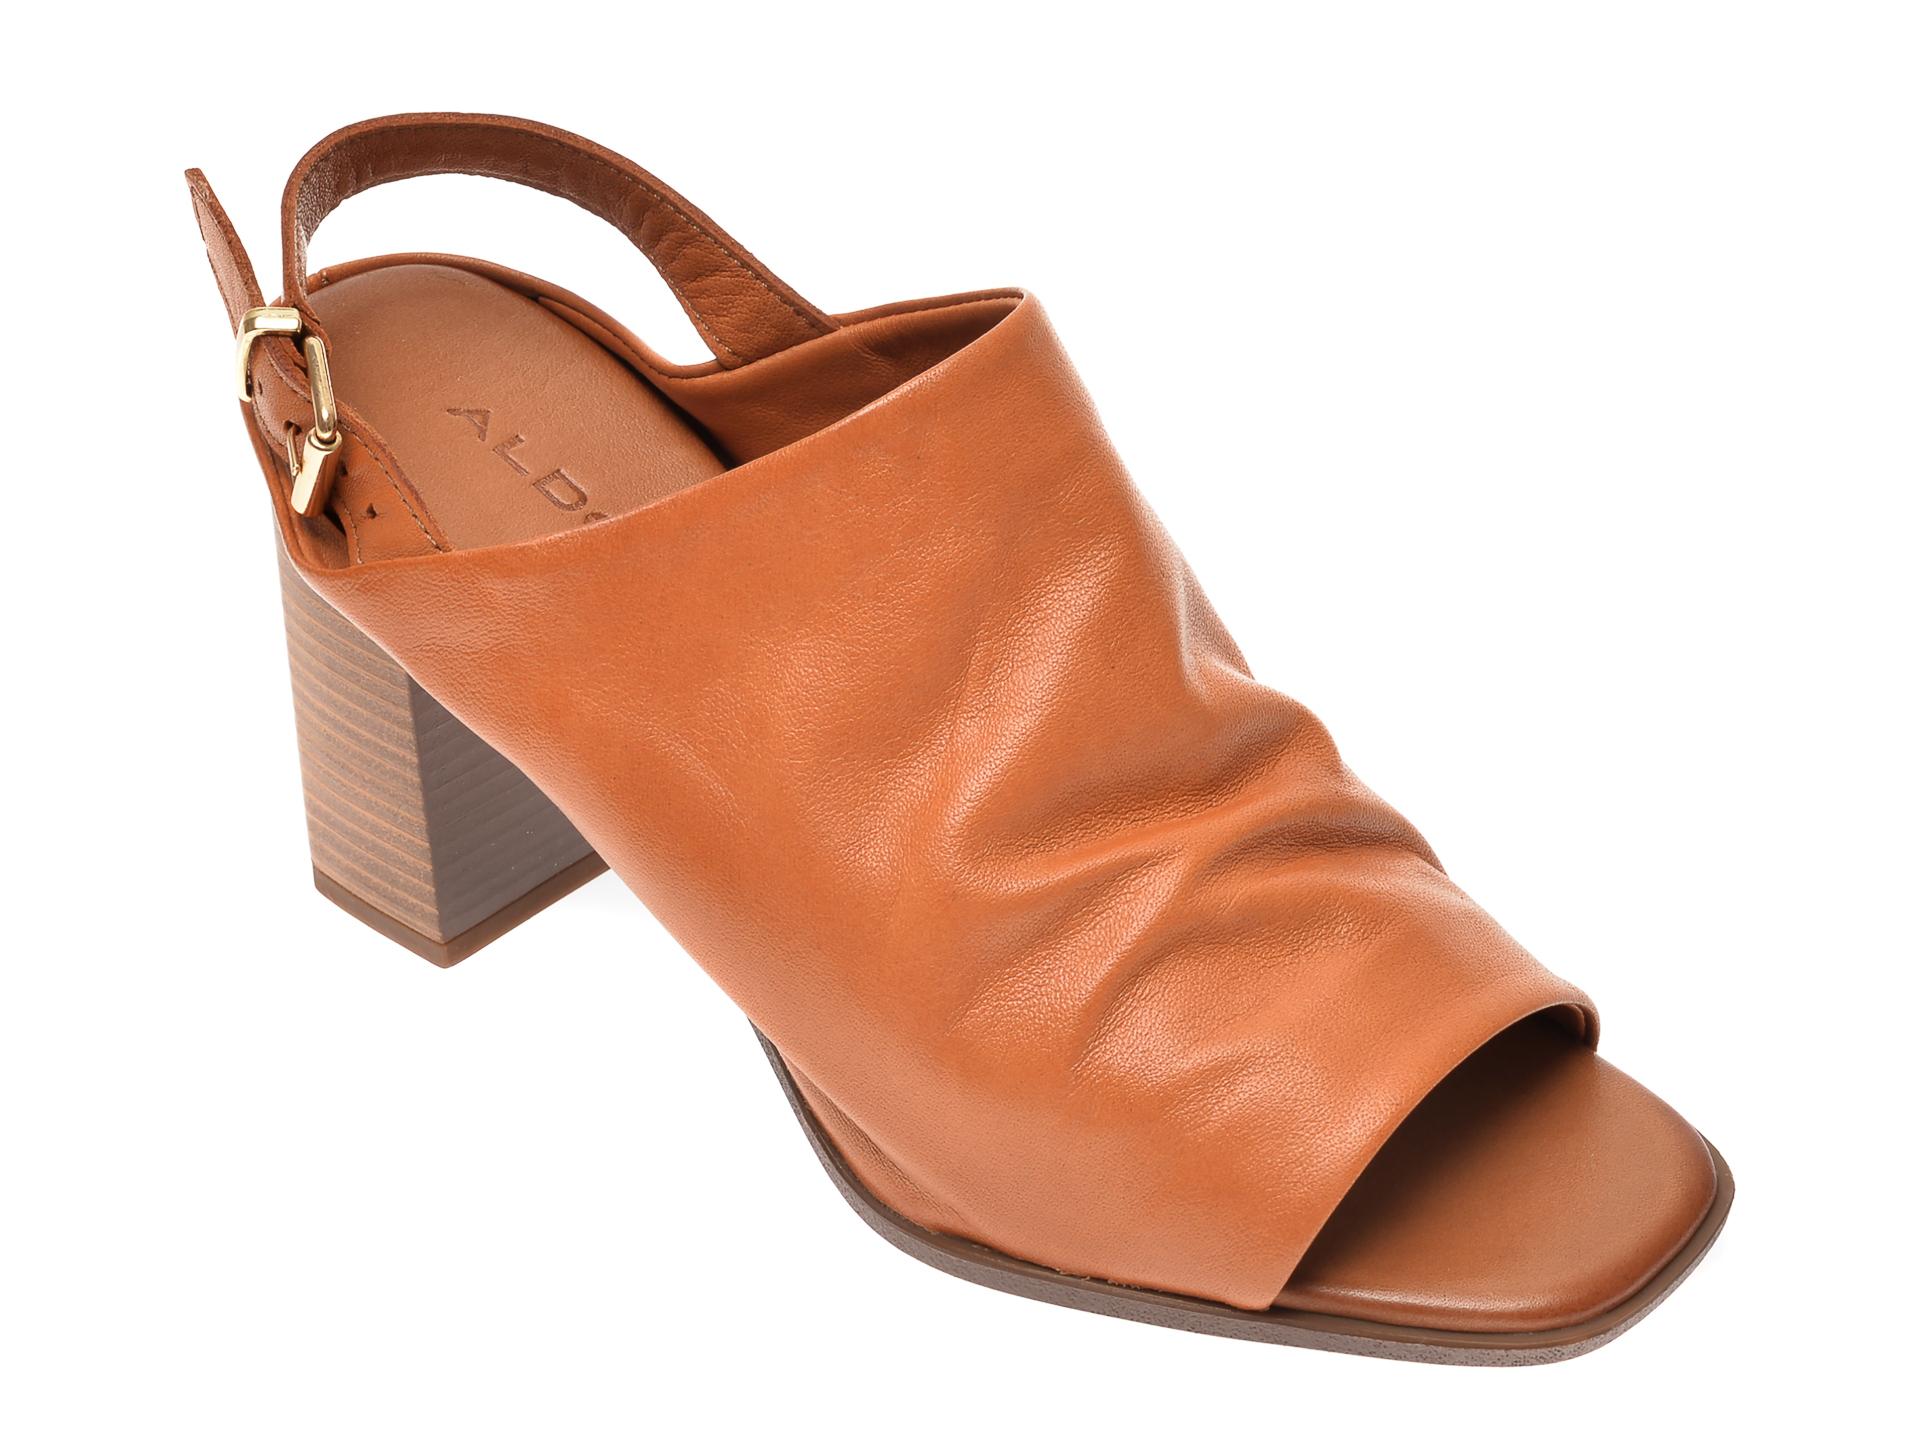 Sandale ALDO maro, Casameada220, din piele naturala imagine otter.ro 2021